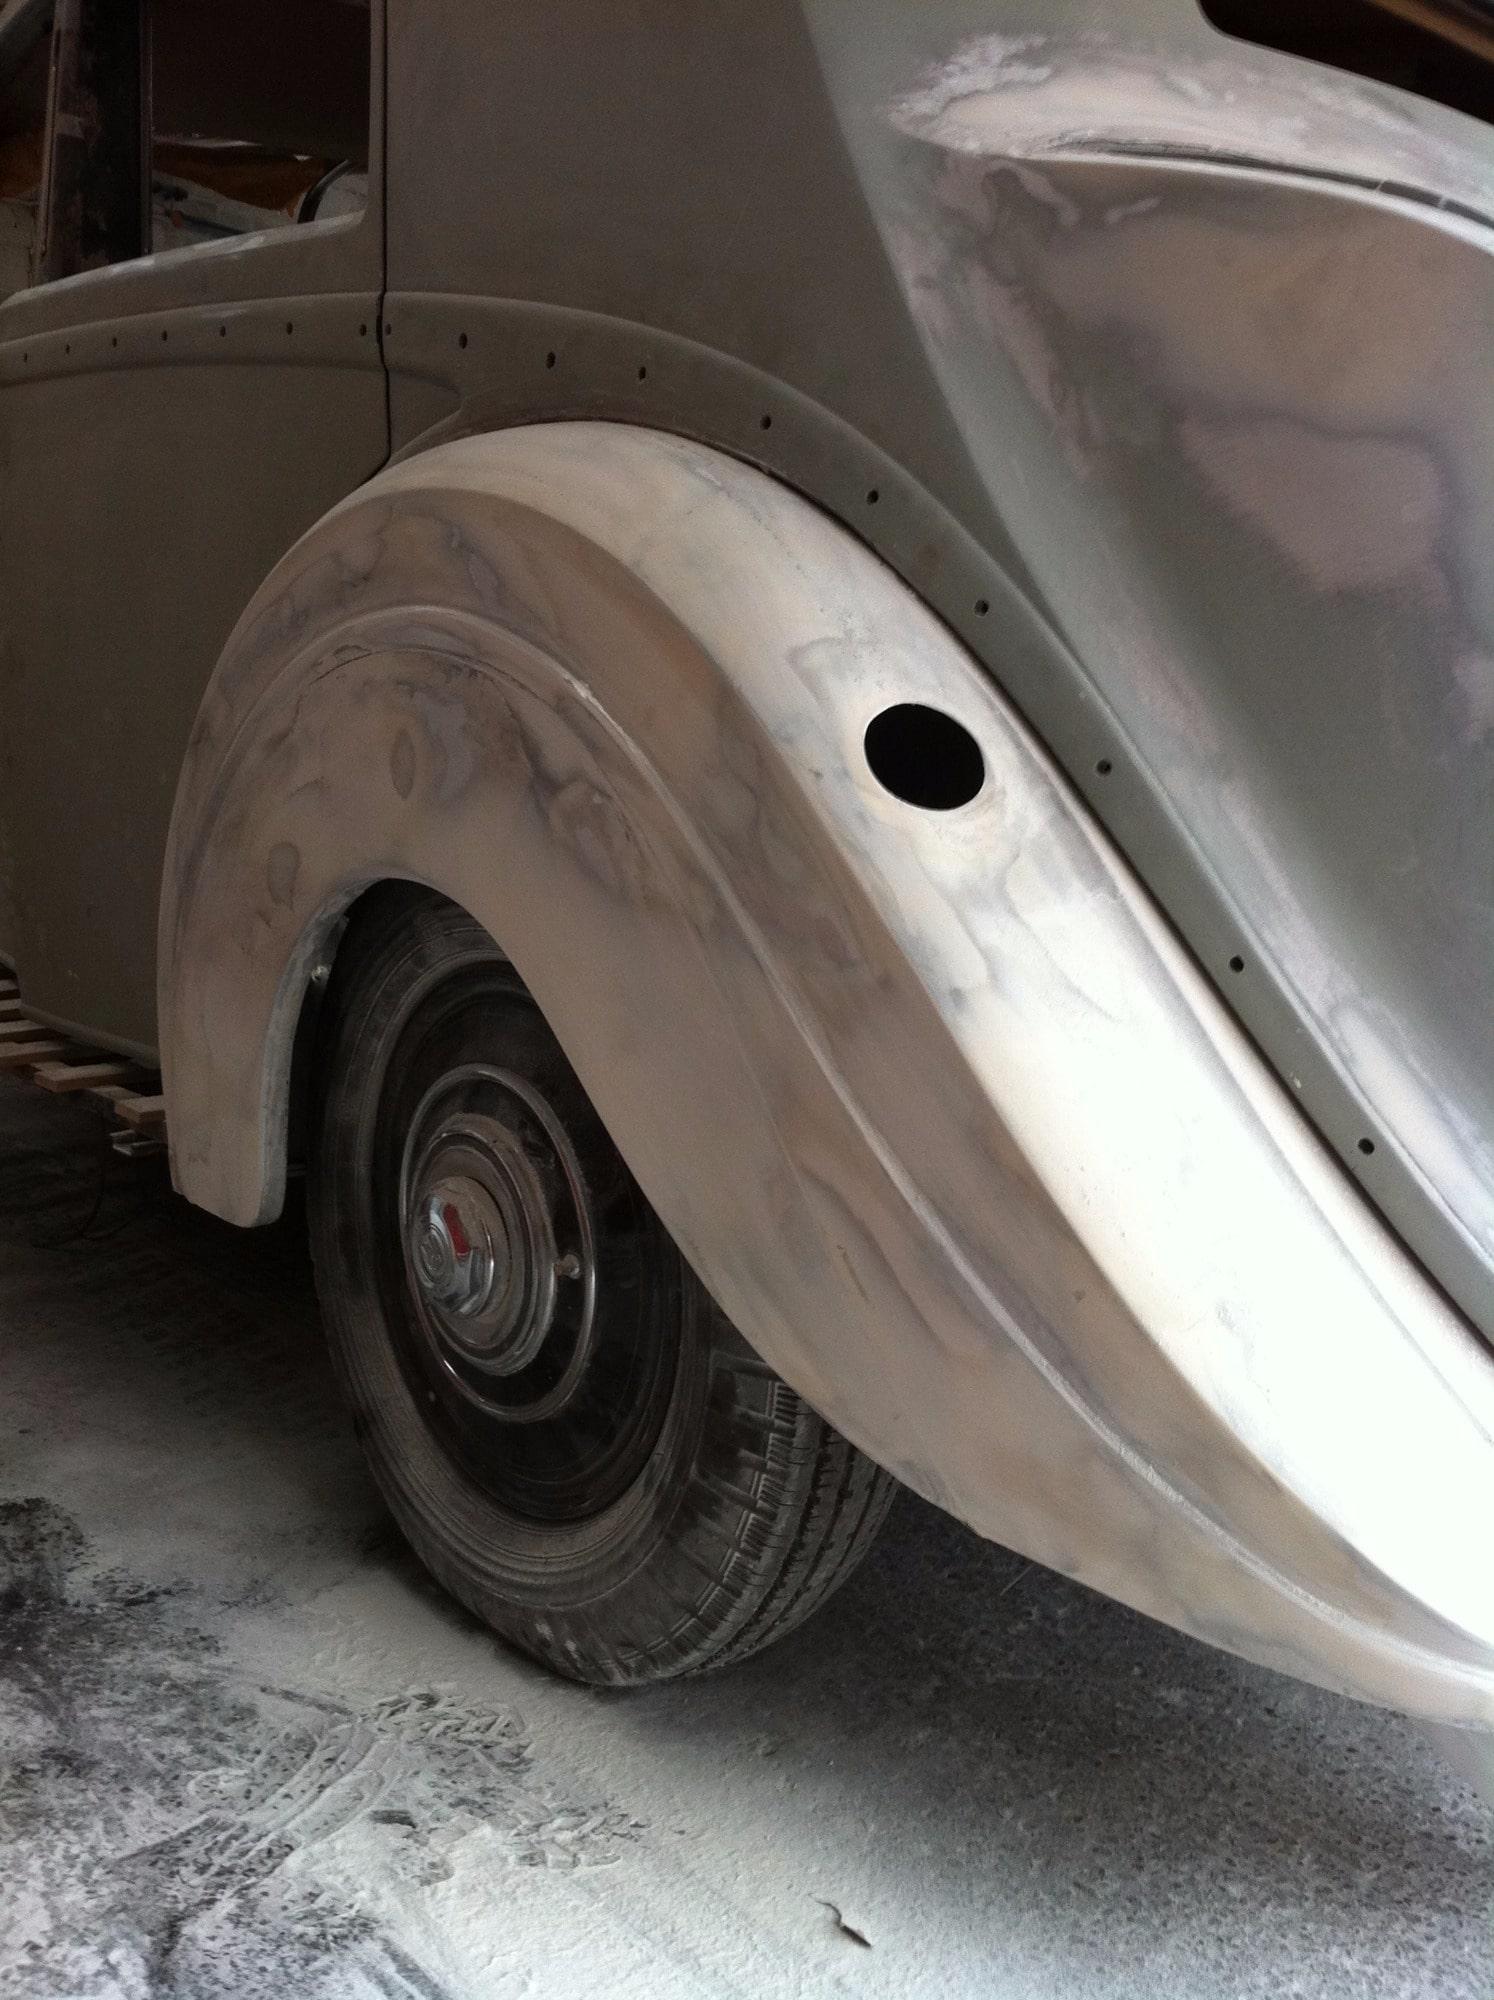 Rolls Royce stripped wheel arch